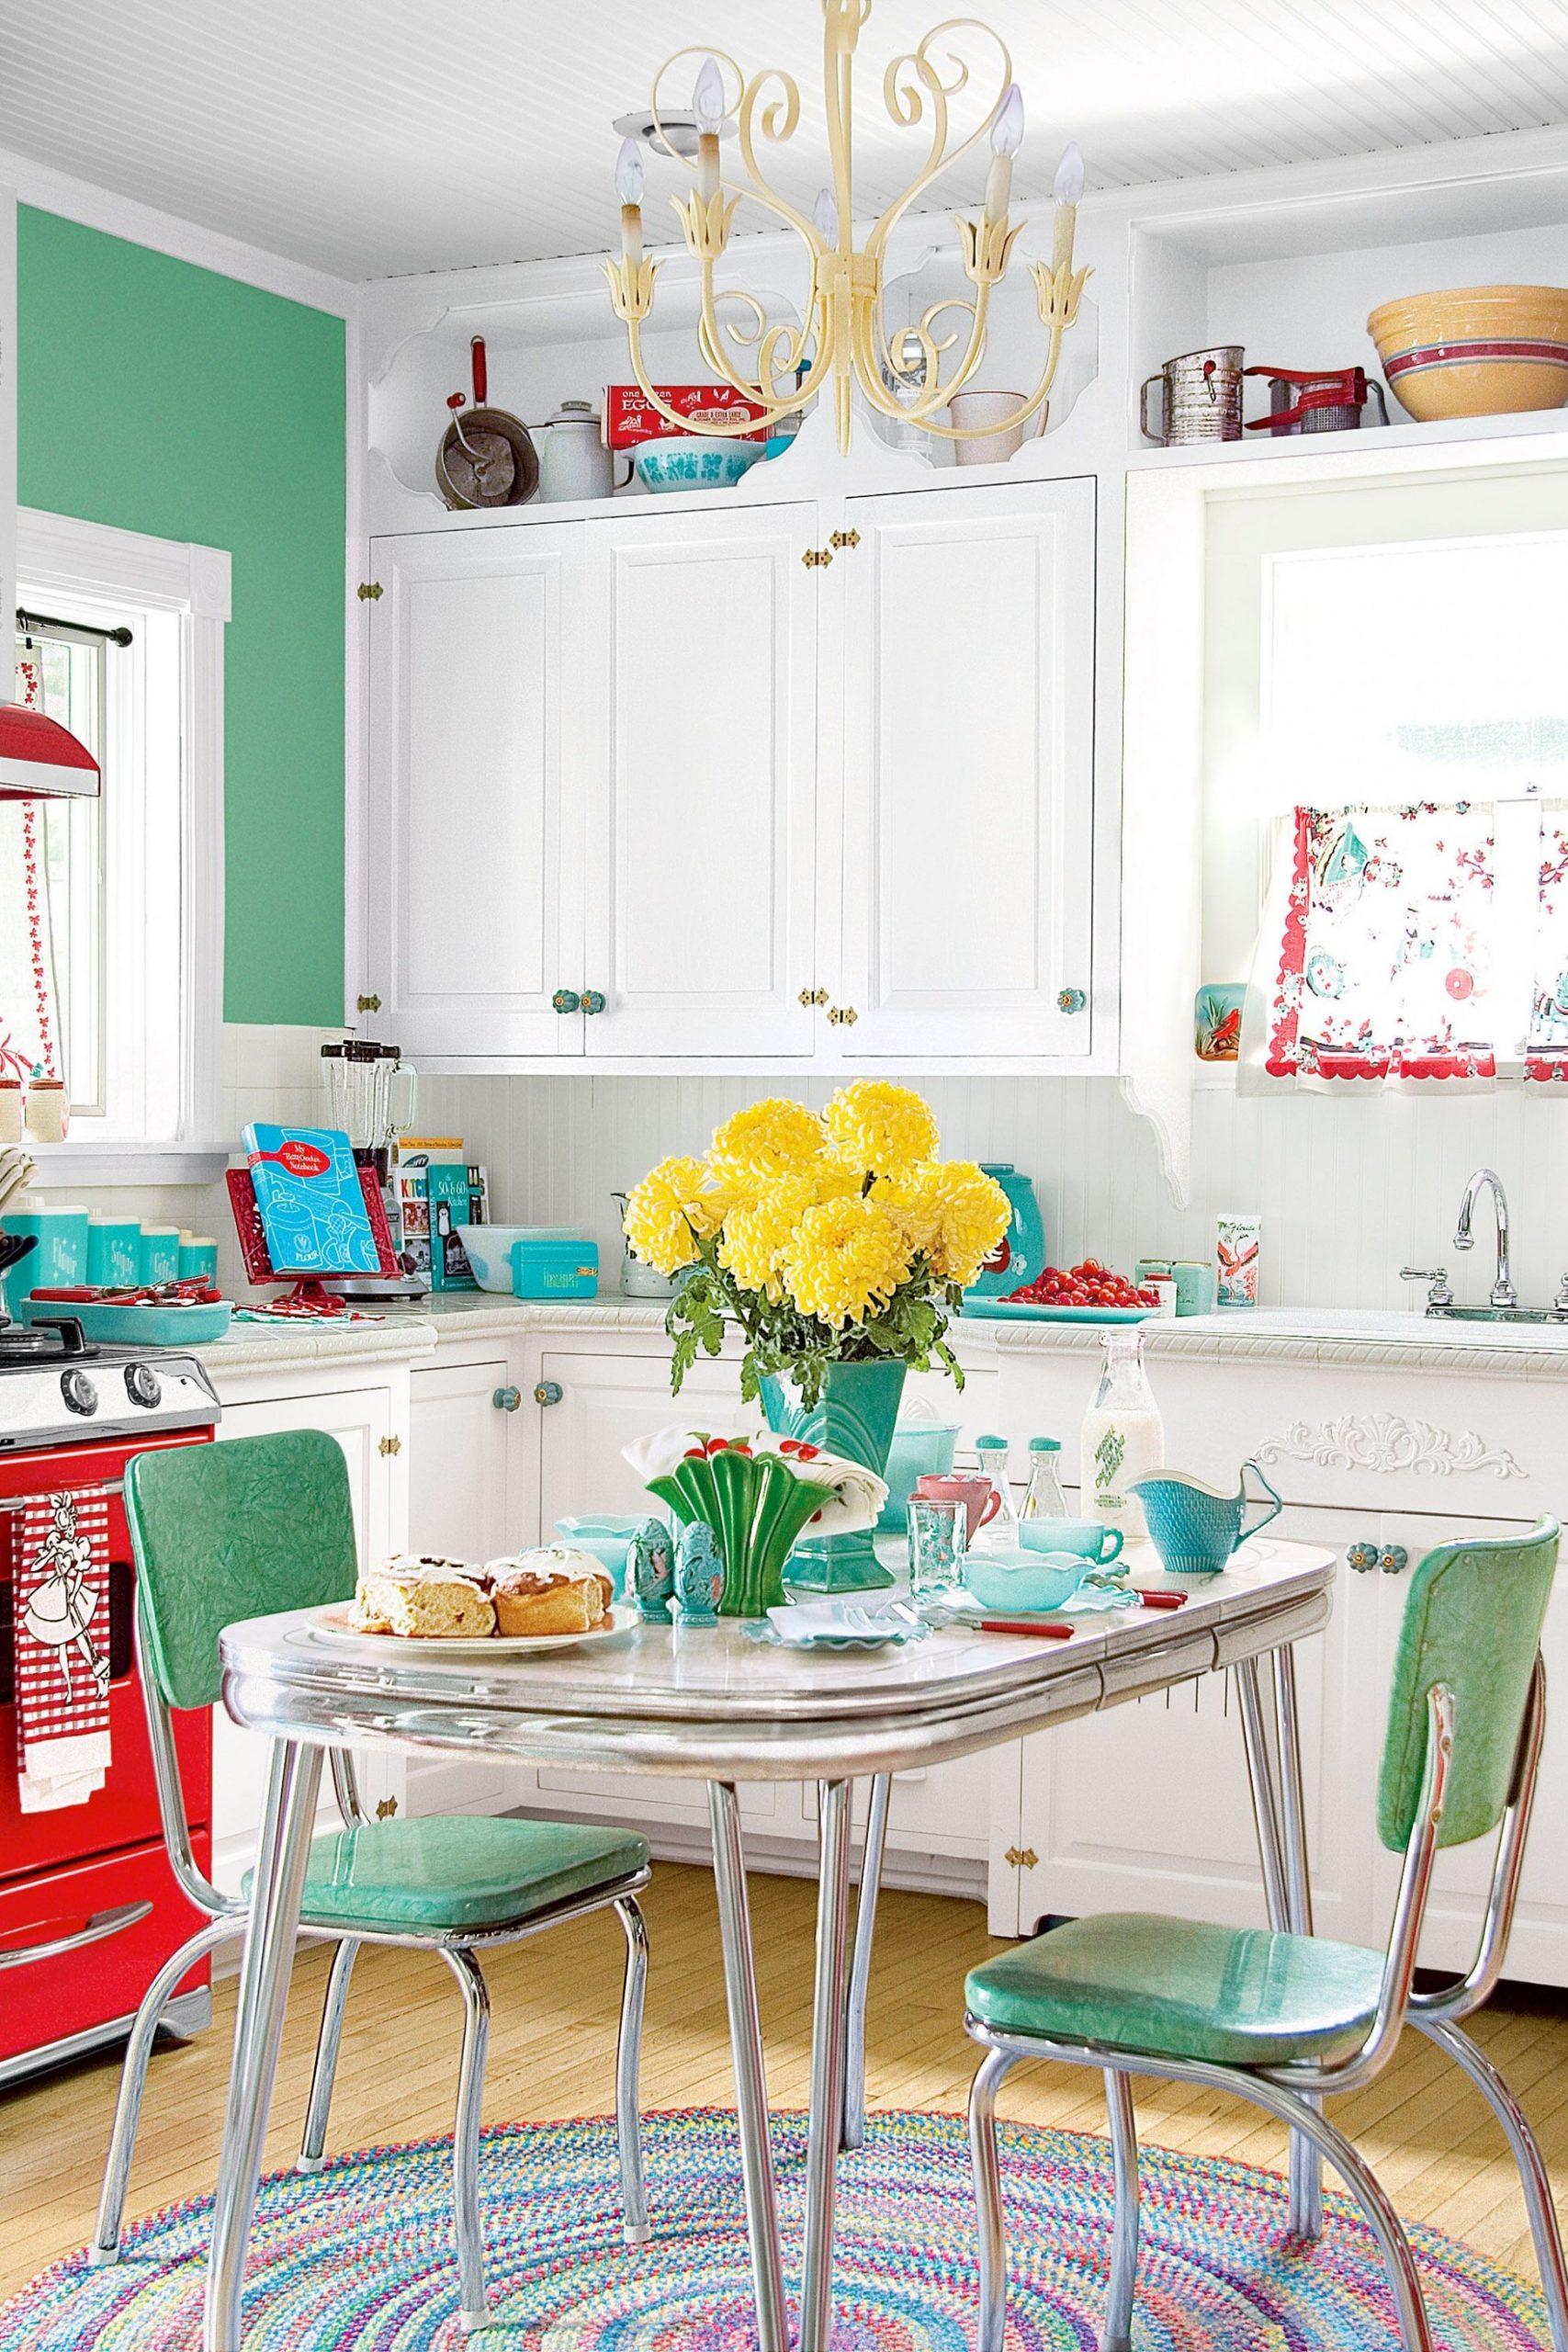 9 Retro Diner Decor Ideas for Your Kitchen - Vintage Kitchen Decor - Dining Room Ideas Retro